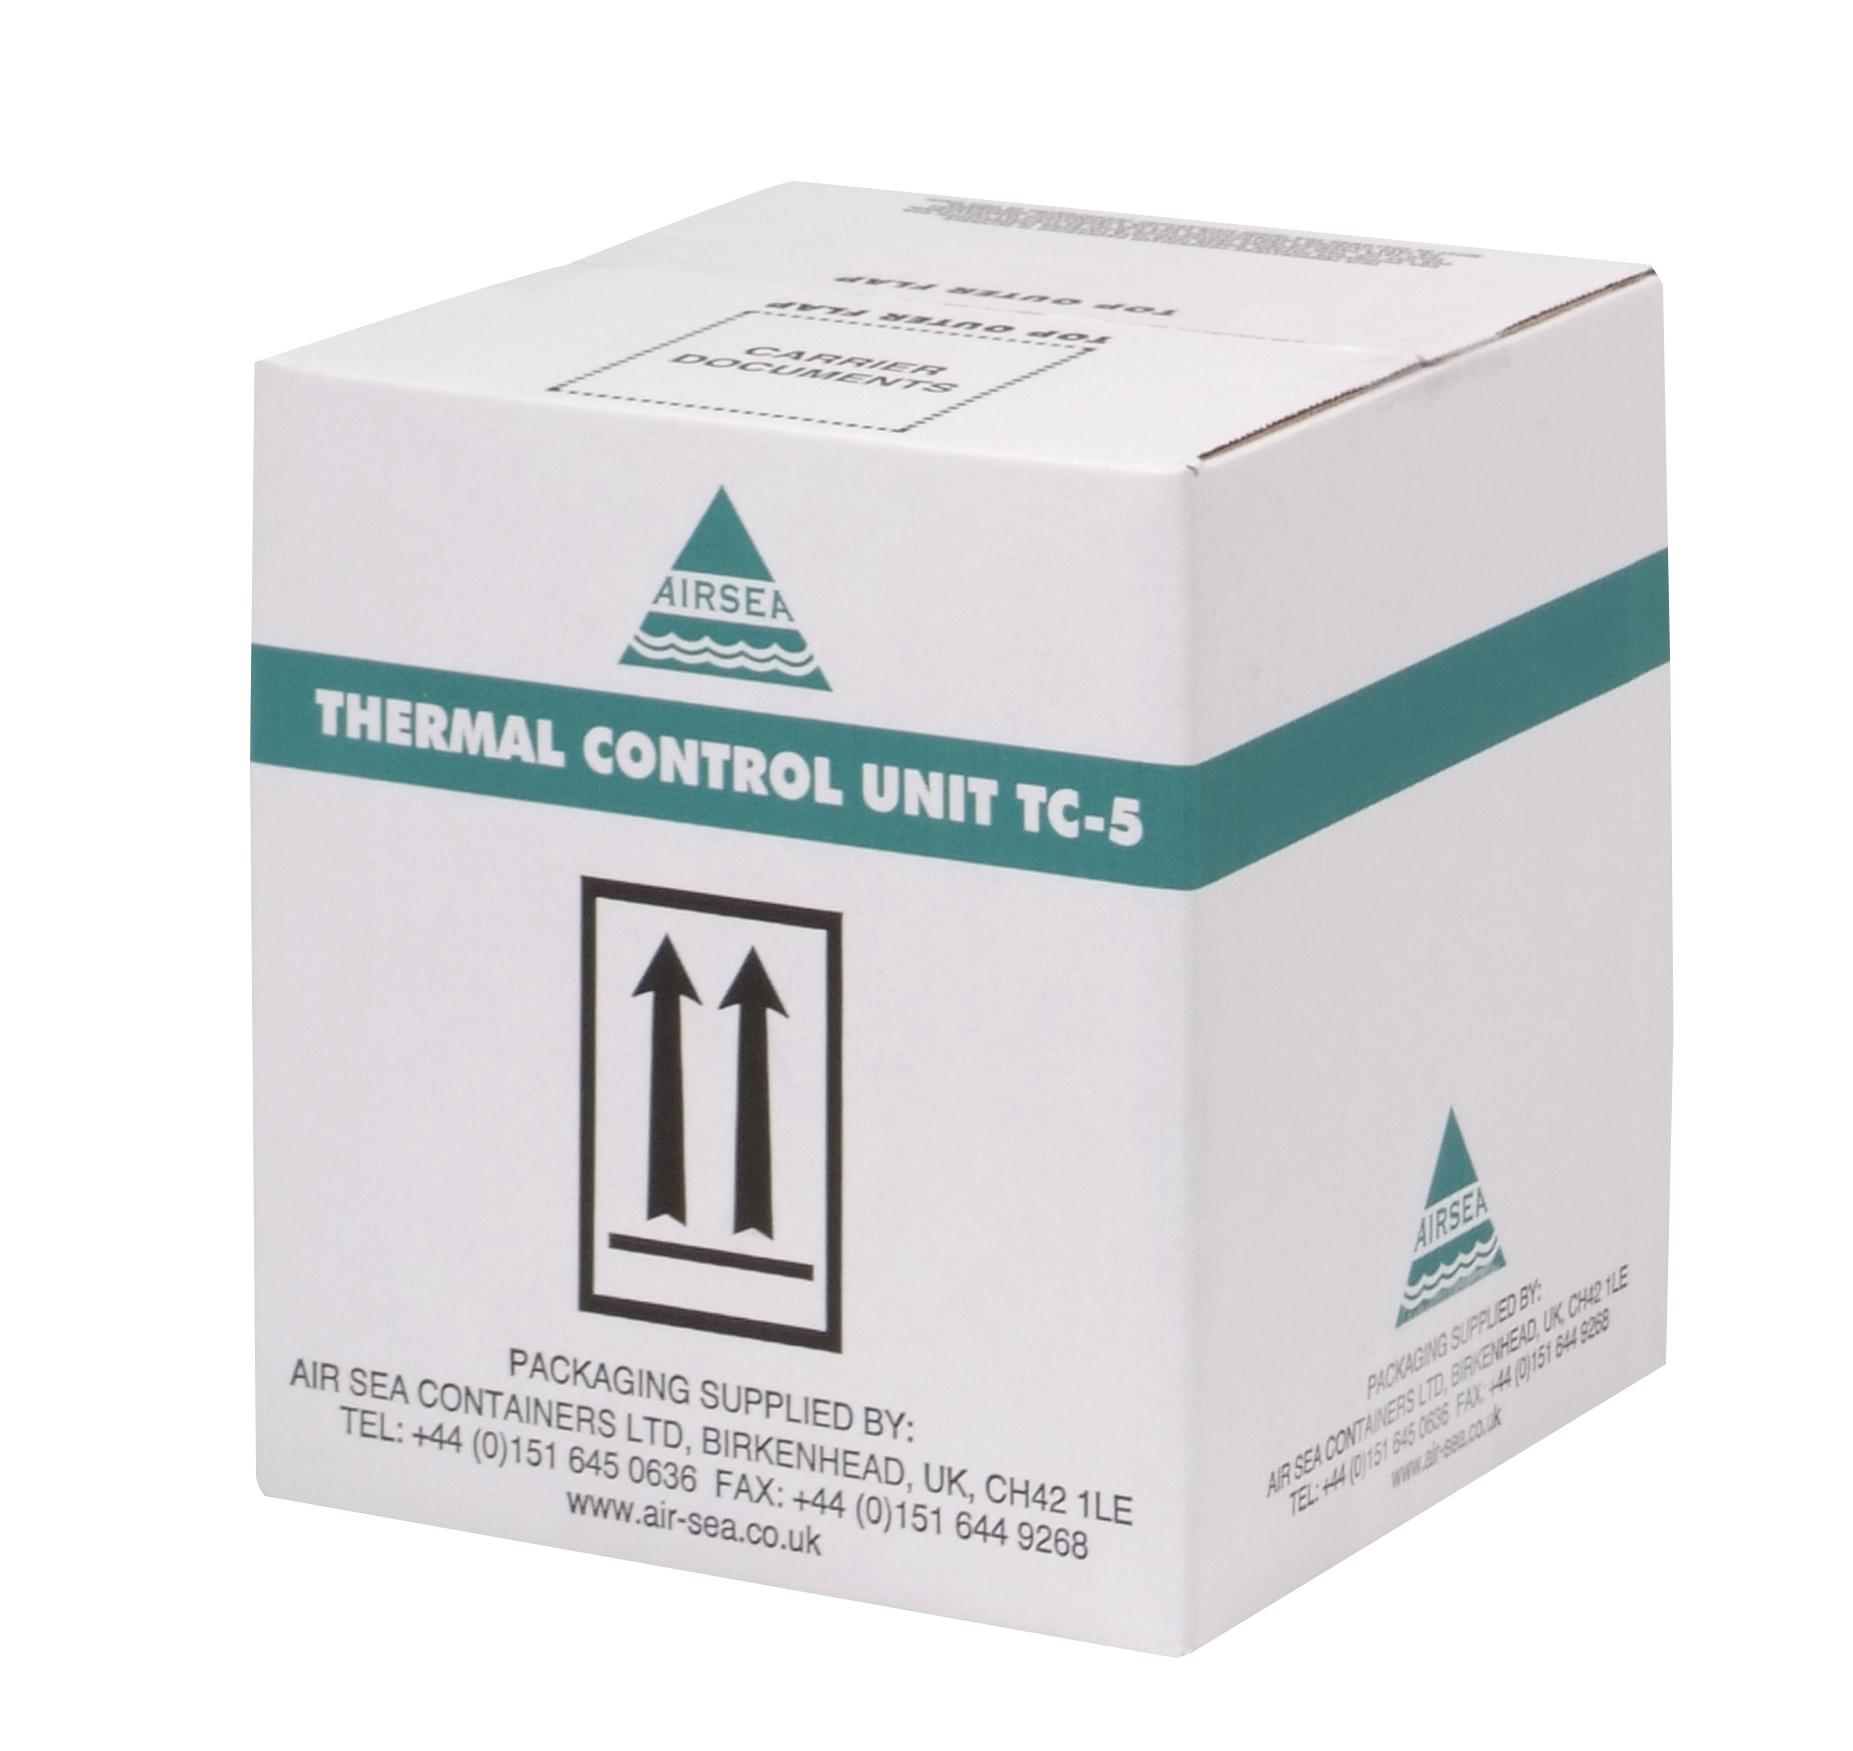 Thermal Control Units: Thermal Control Unit TC-5